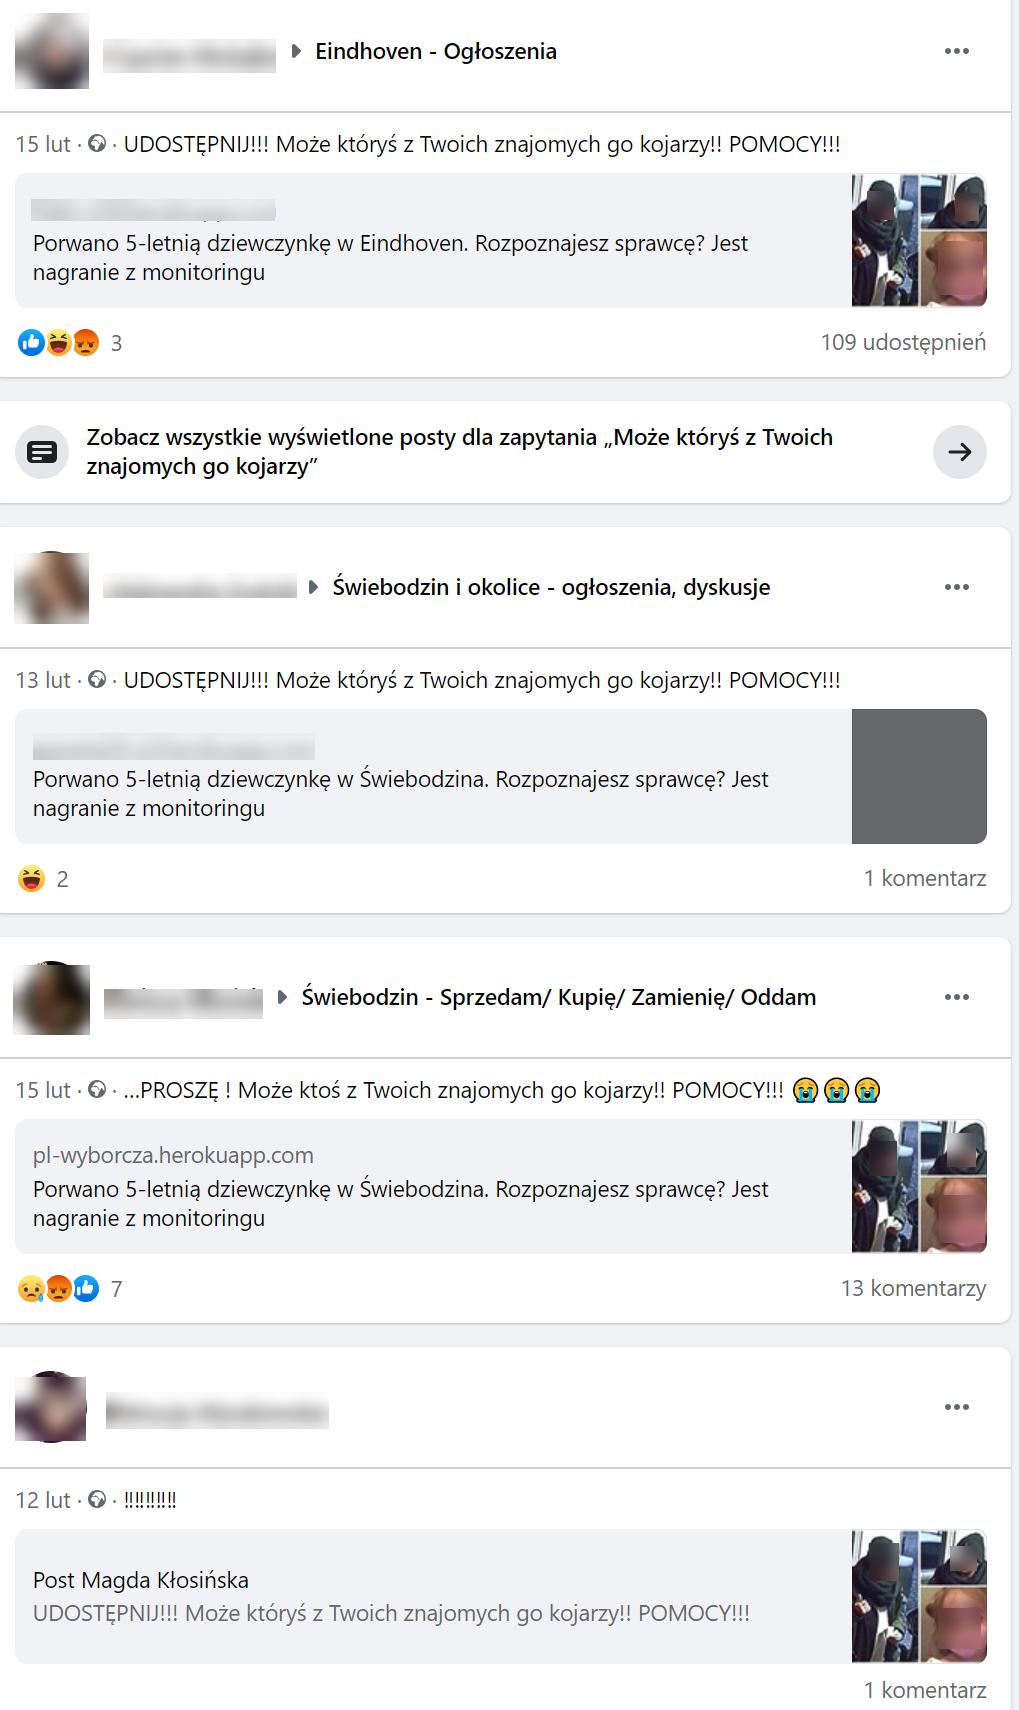 Wpisy na Facebooku o rzekomym porwaniu kilkulatki